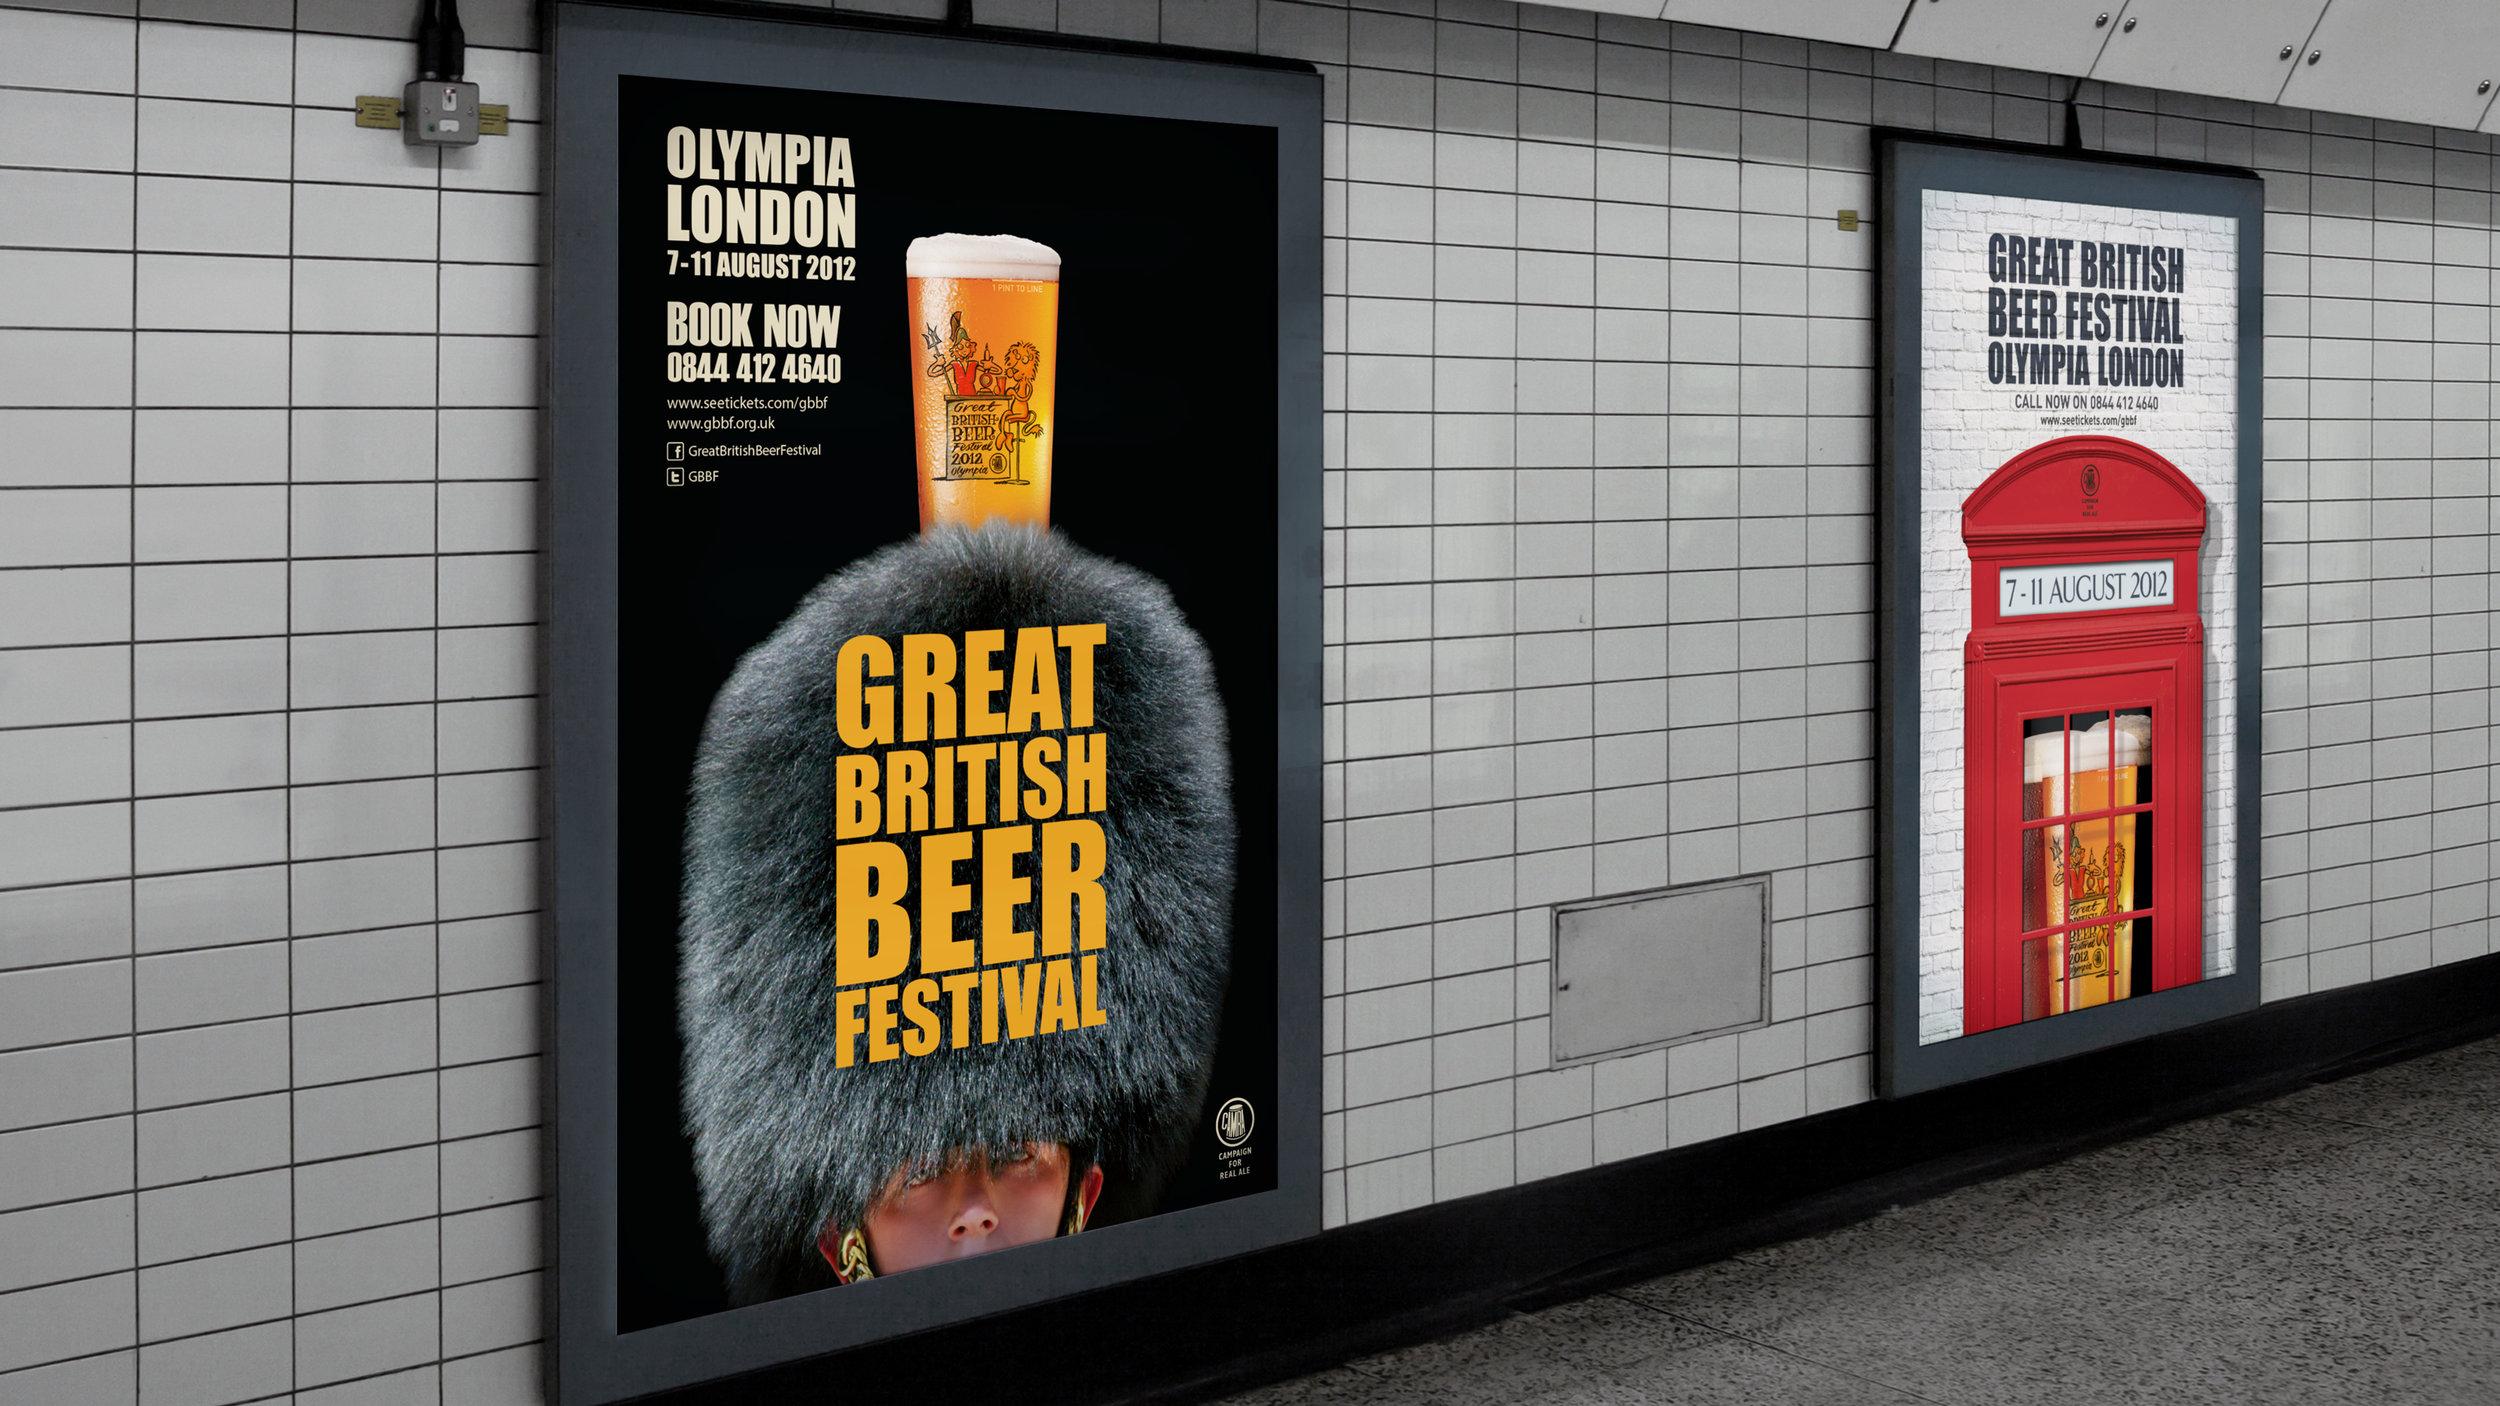 Brand_republica_camra_great_british_beer_festival_london_underground_posters.jpg